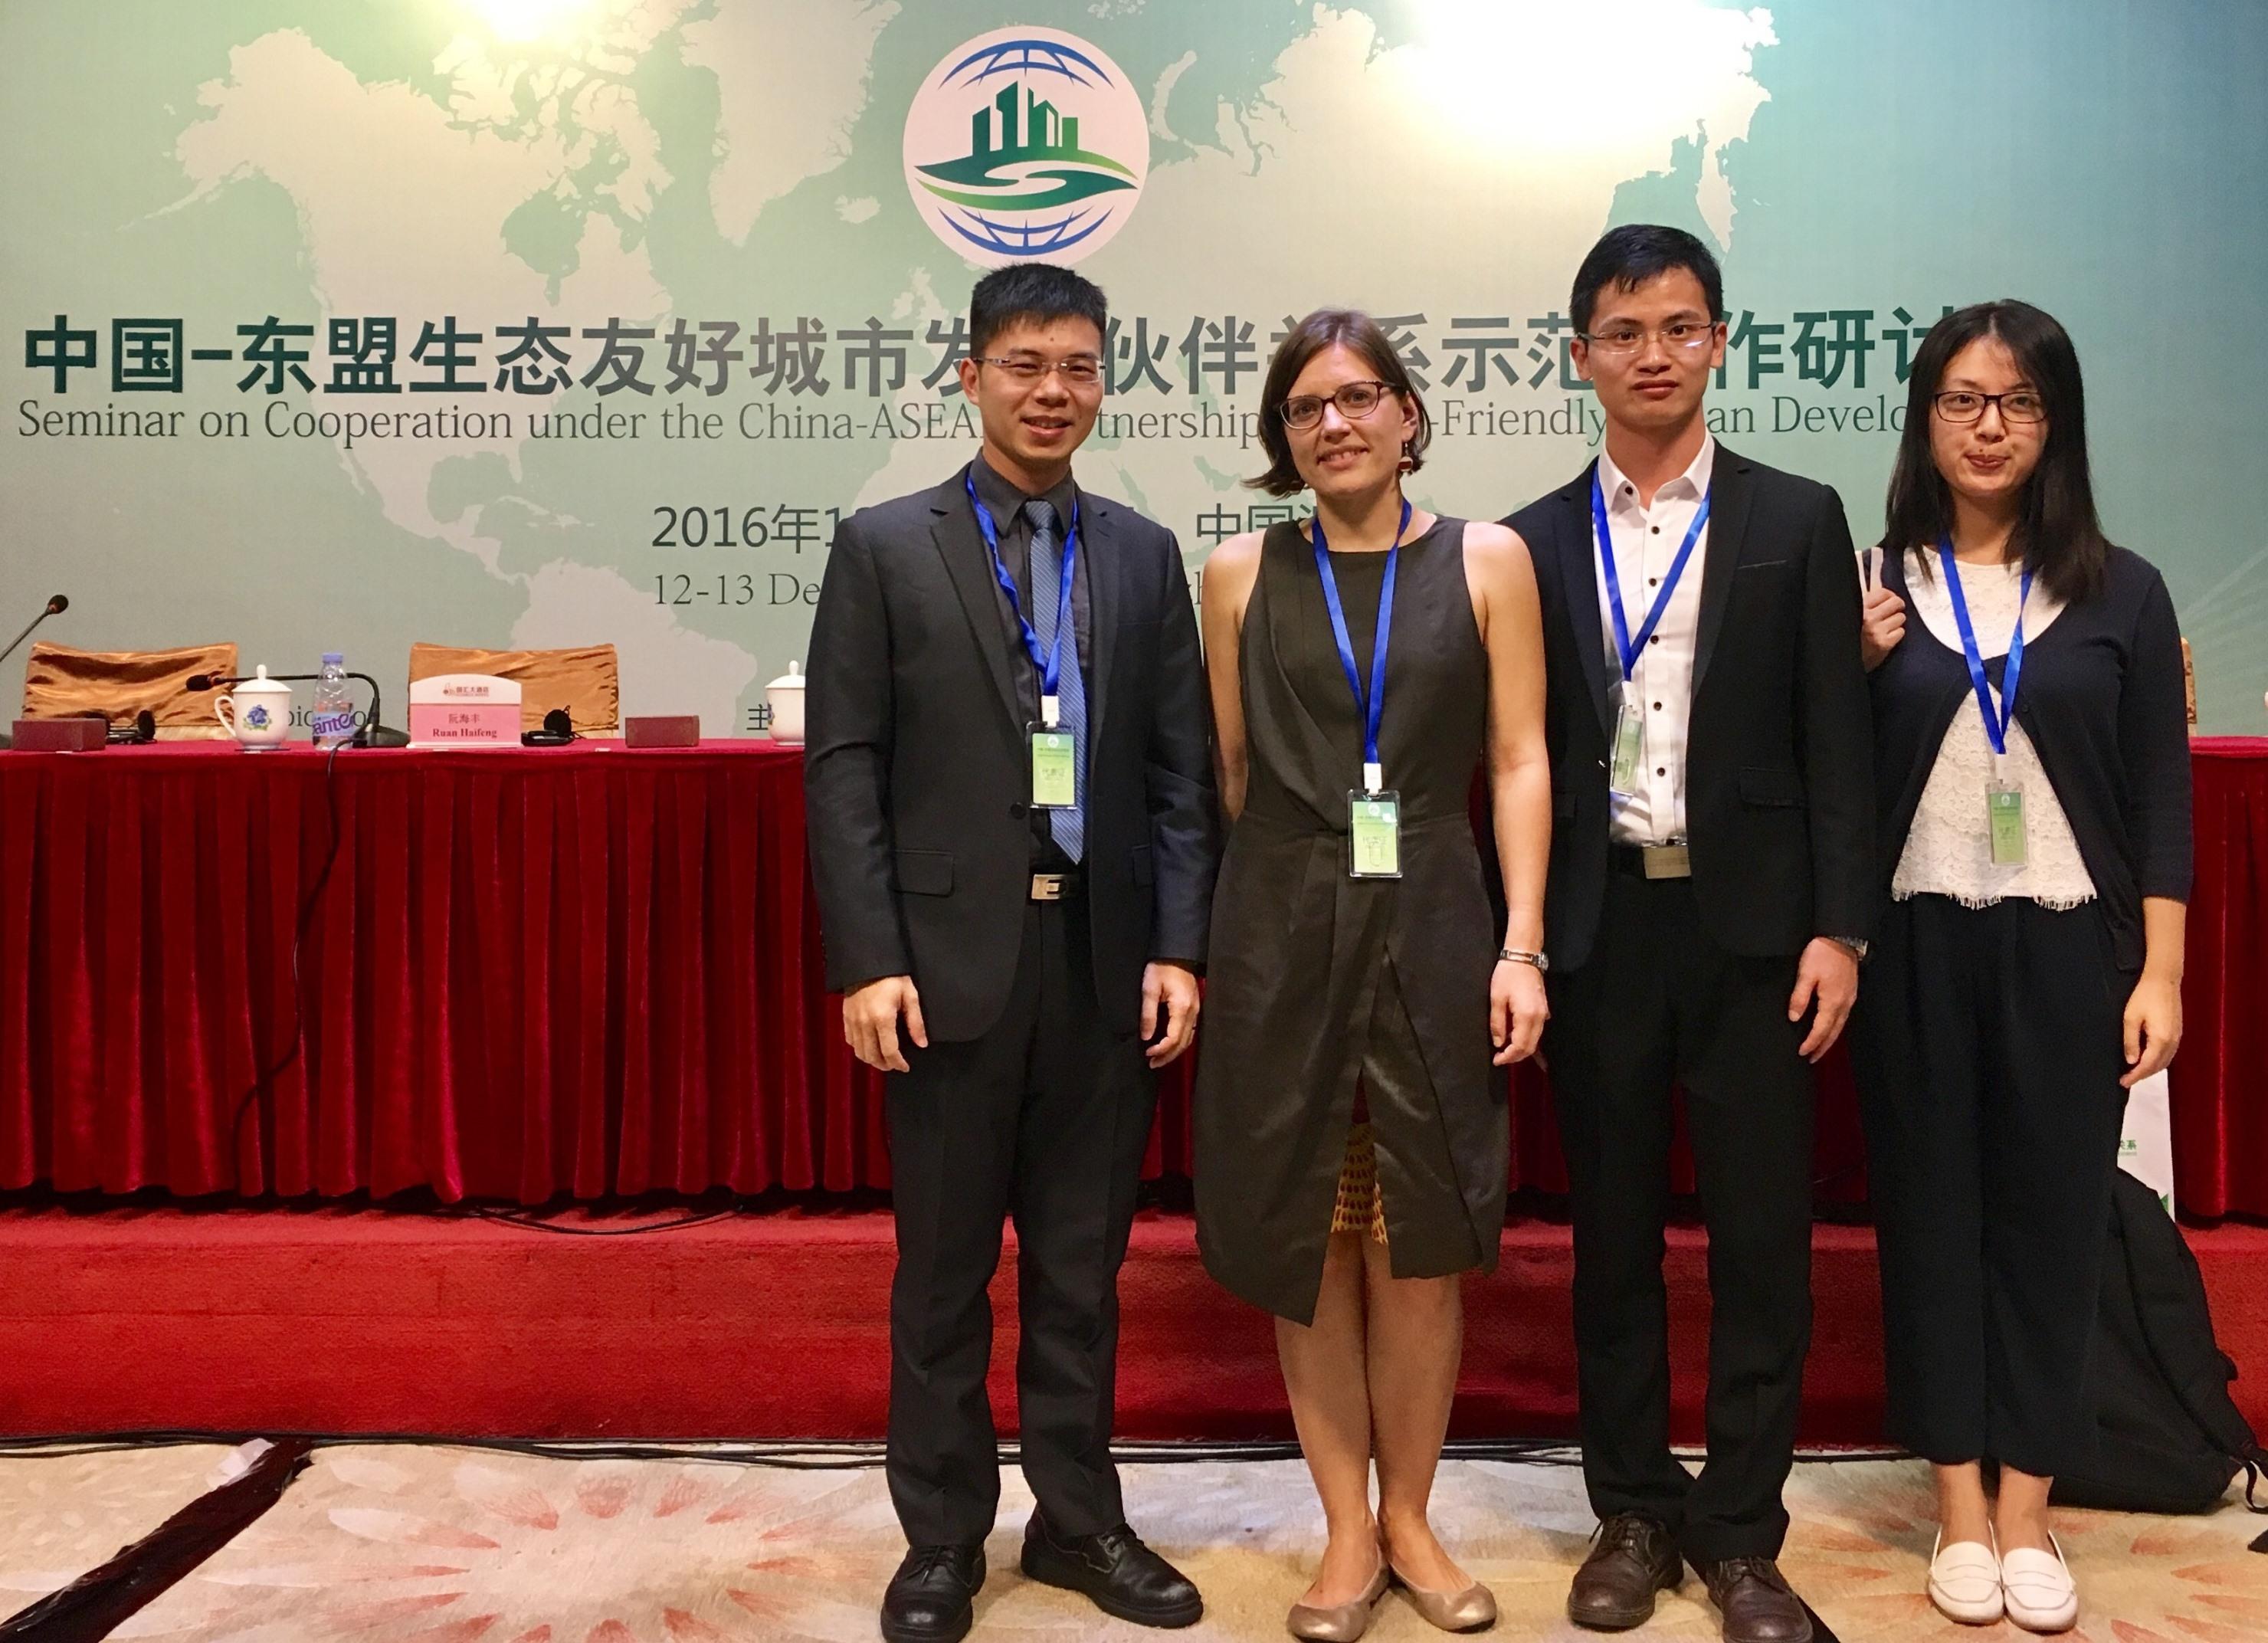 Dr. Zhang Hongsheng (1st left) and Ms. Nina Raasakka, UNEP officer (2nd left).